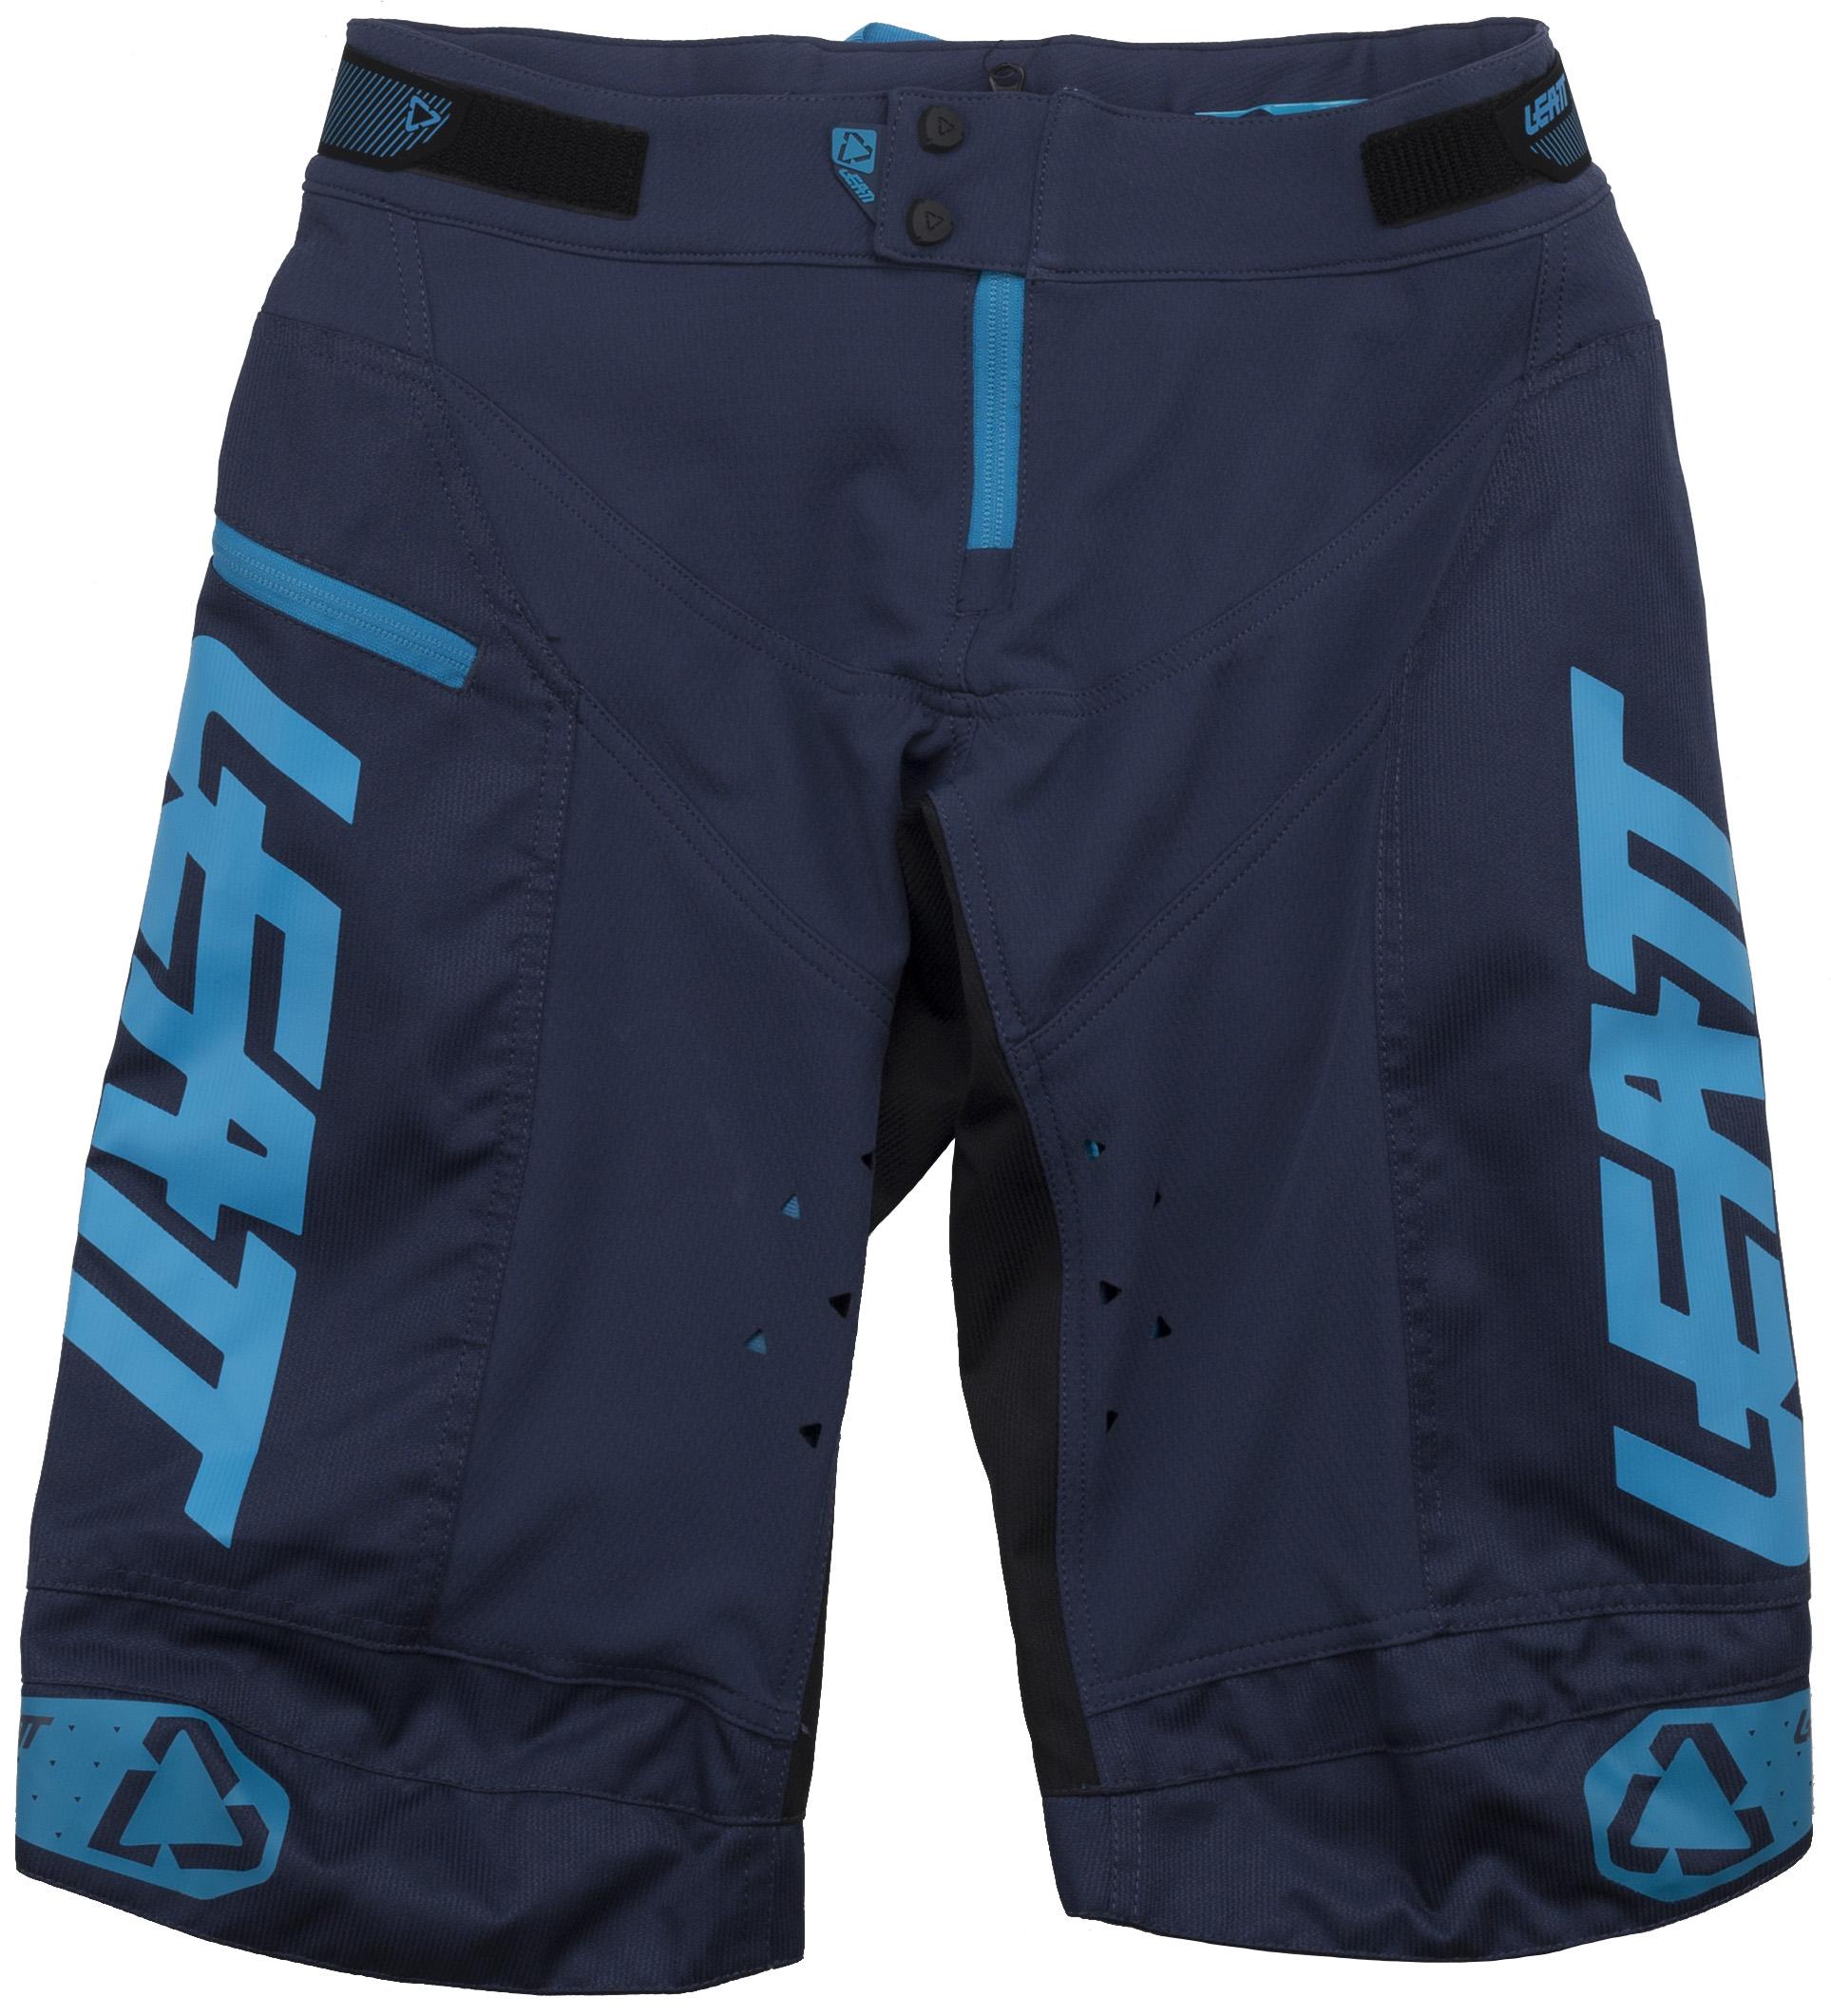 leatt dbx 4.0 shorts review